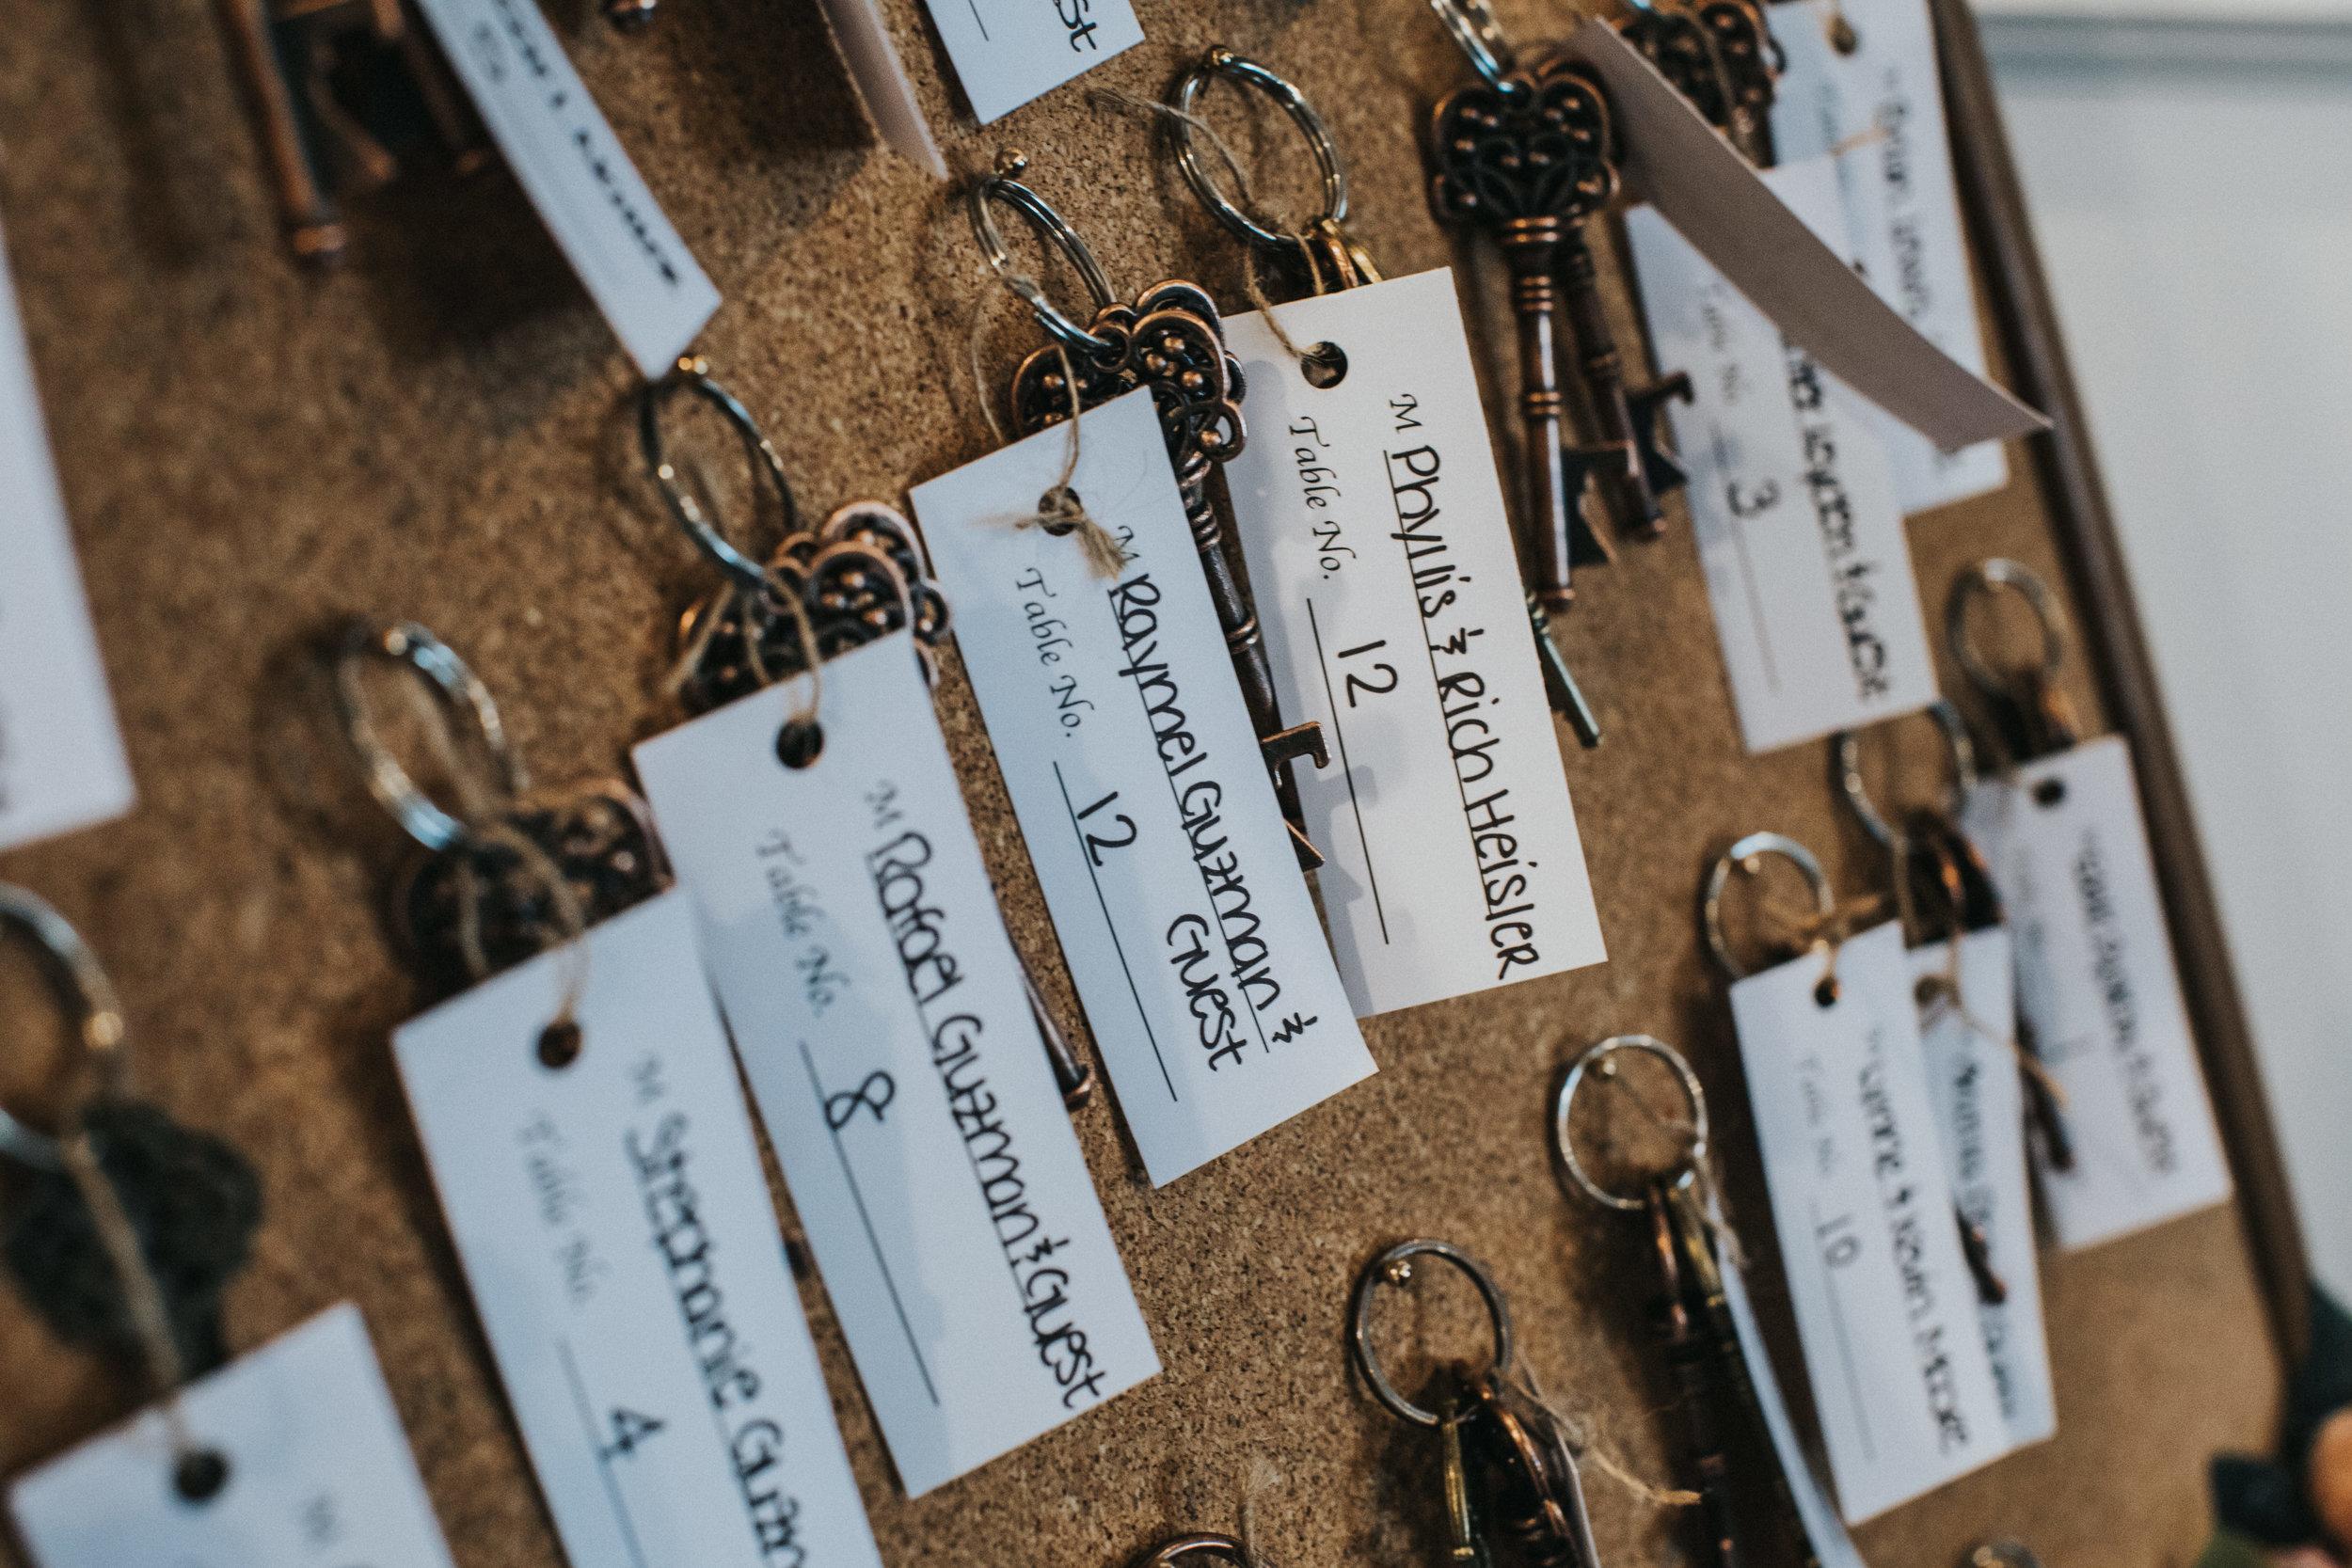 New-Jersey-Wedding-Photographer-ReceptionCenter-Valeria&Mike-Venue_Details (1 of 21).jpg